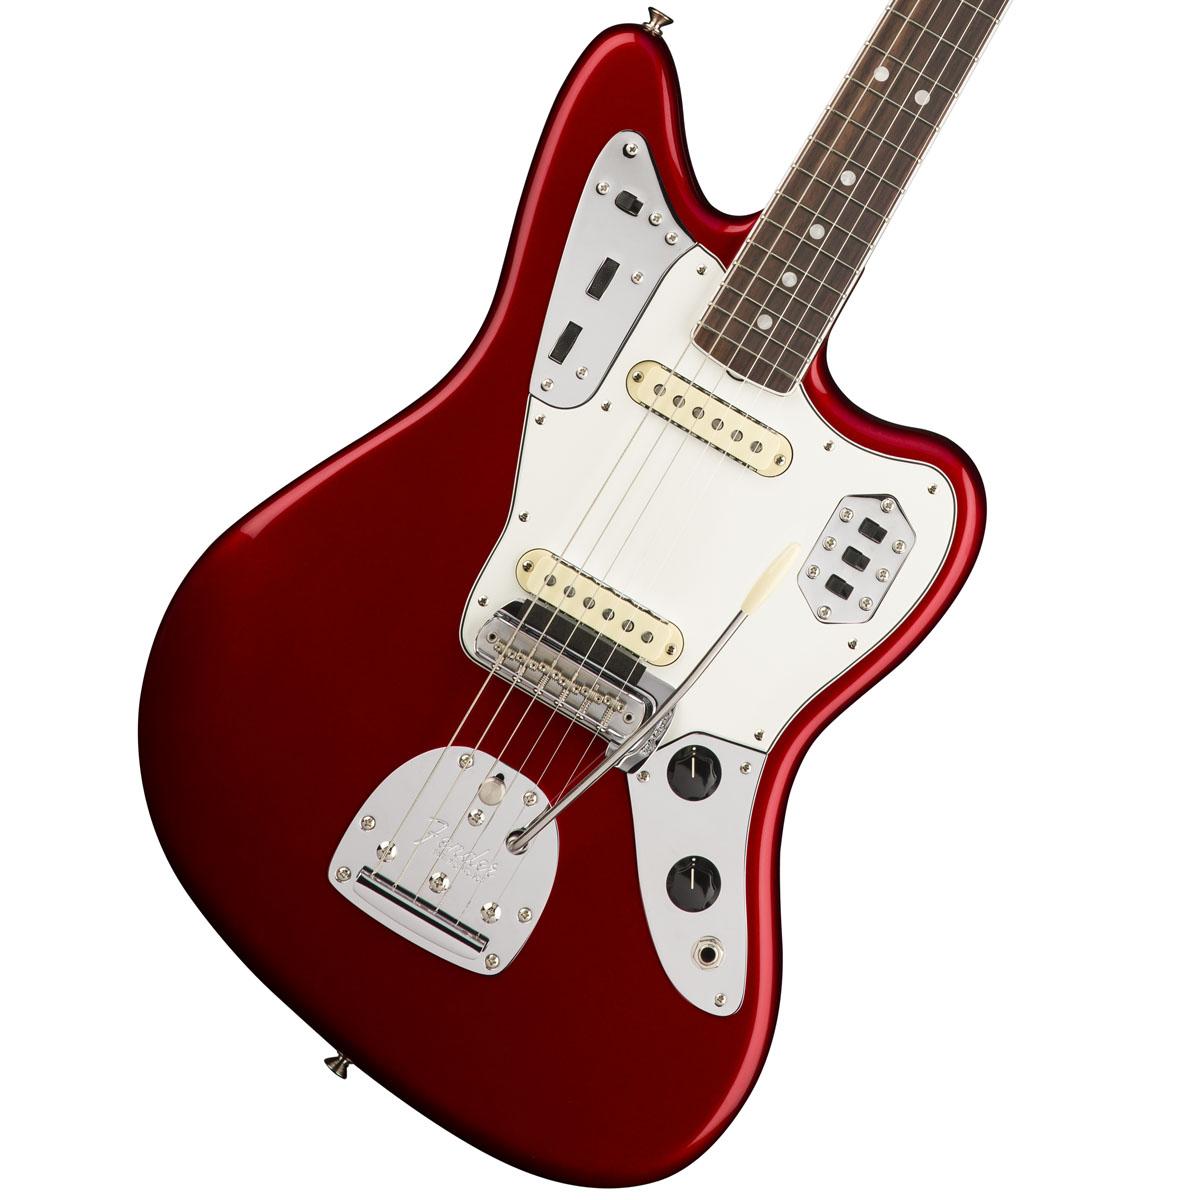 Fender USA / American Original 60s Jaguar Candy Apple Red 《カスタムショップのお手入れ用品を進呈/+671038200》《フェンダー純正グッズを進呈/+79083》